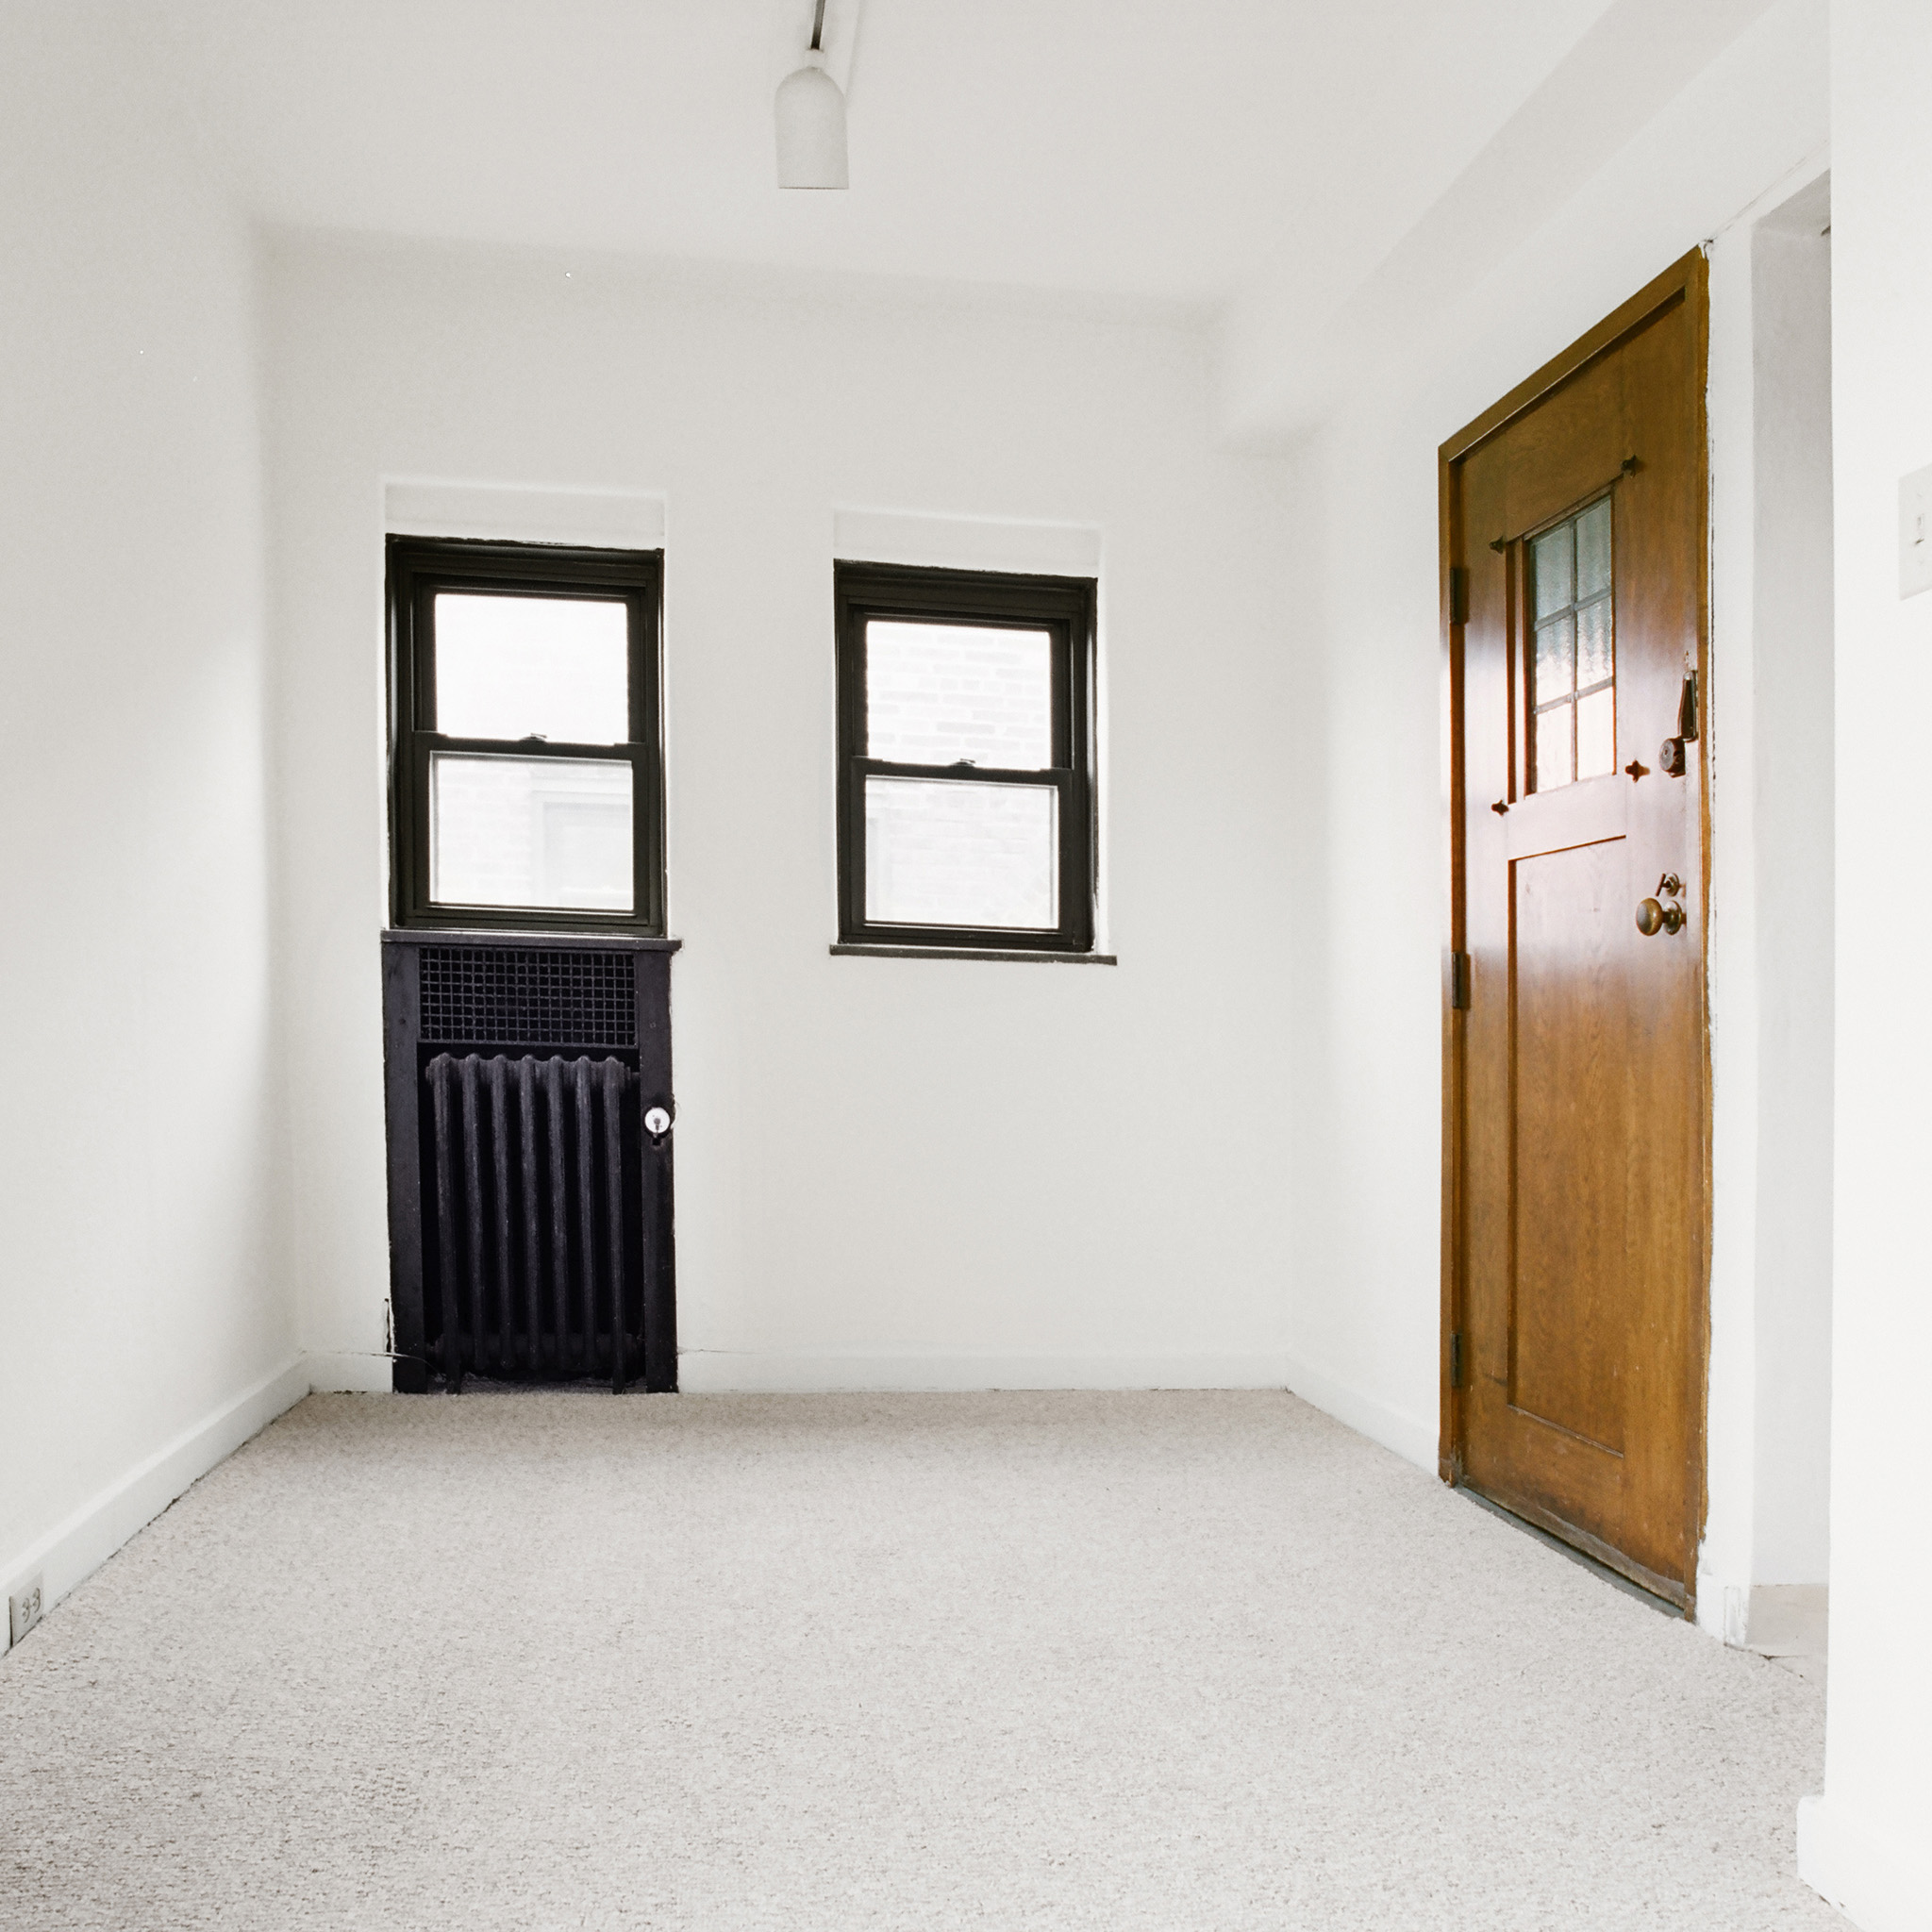 interior of 342 S. Highland Ave, Apt. 16B 2